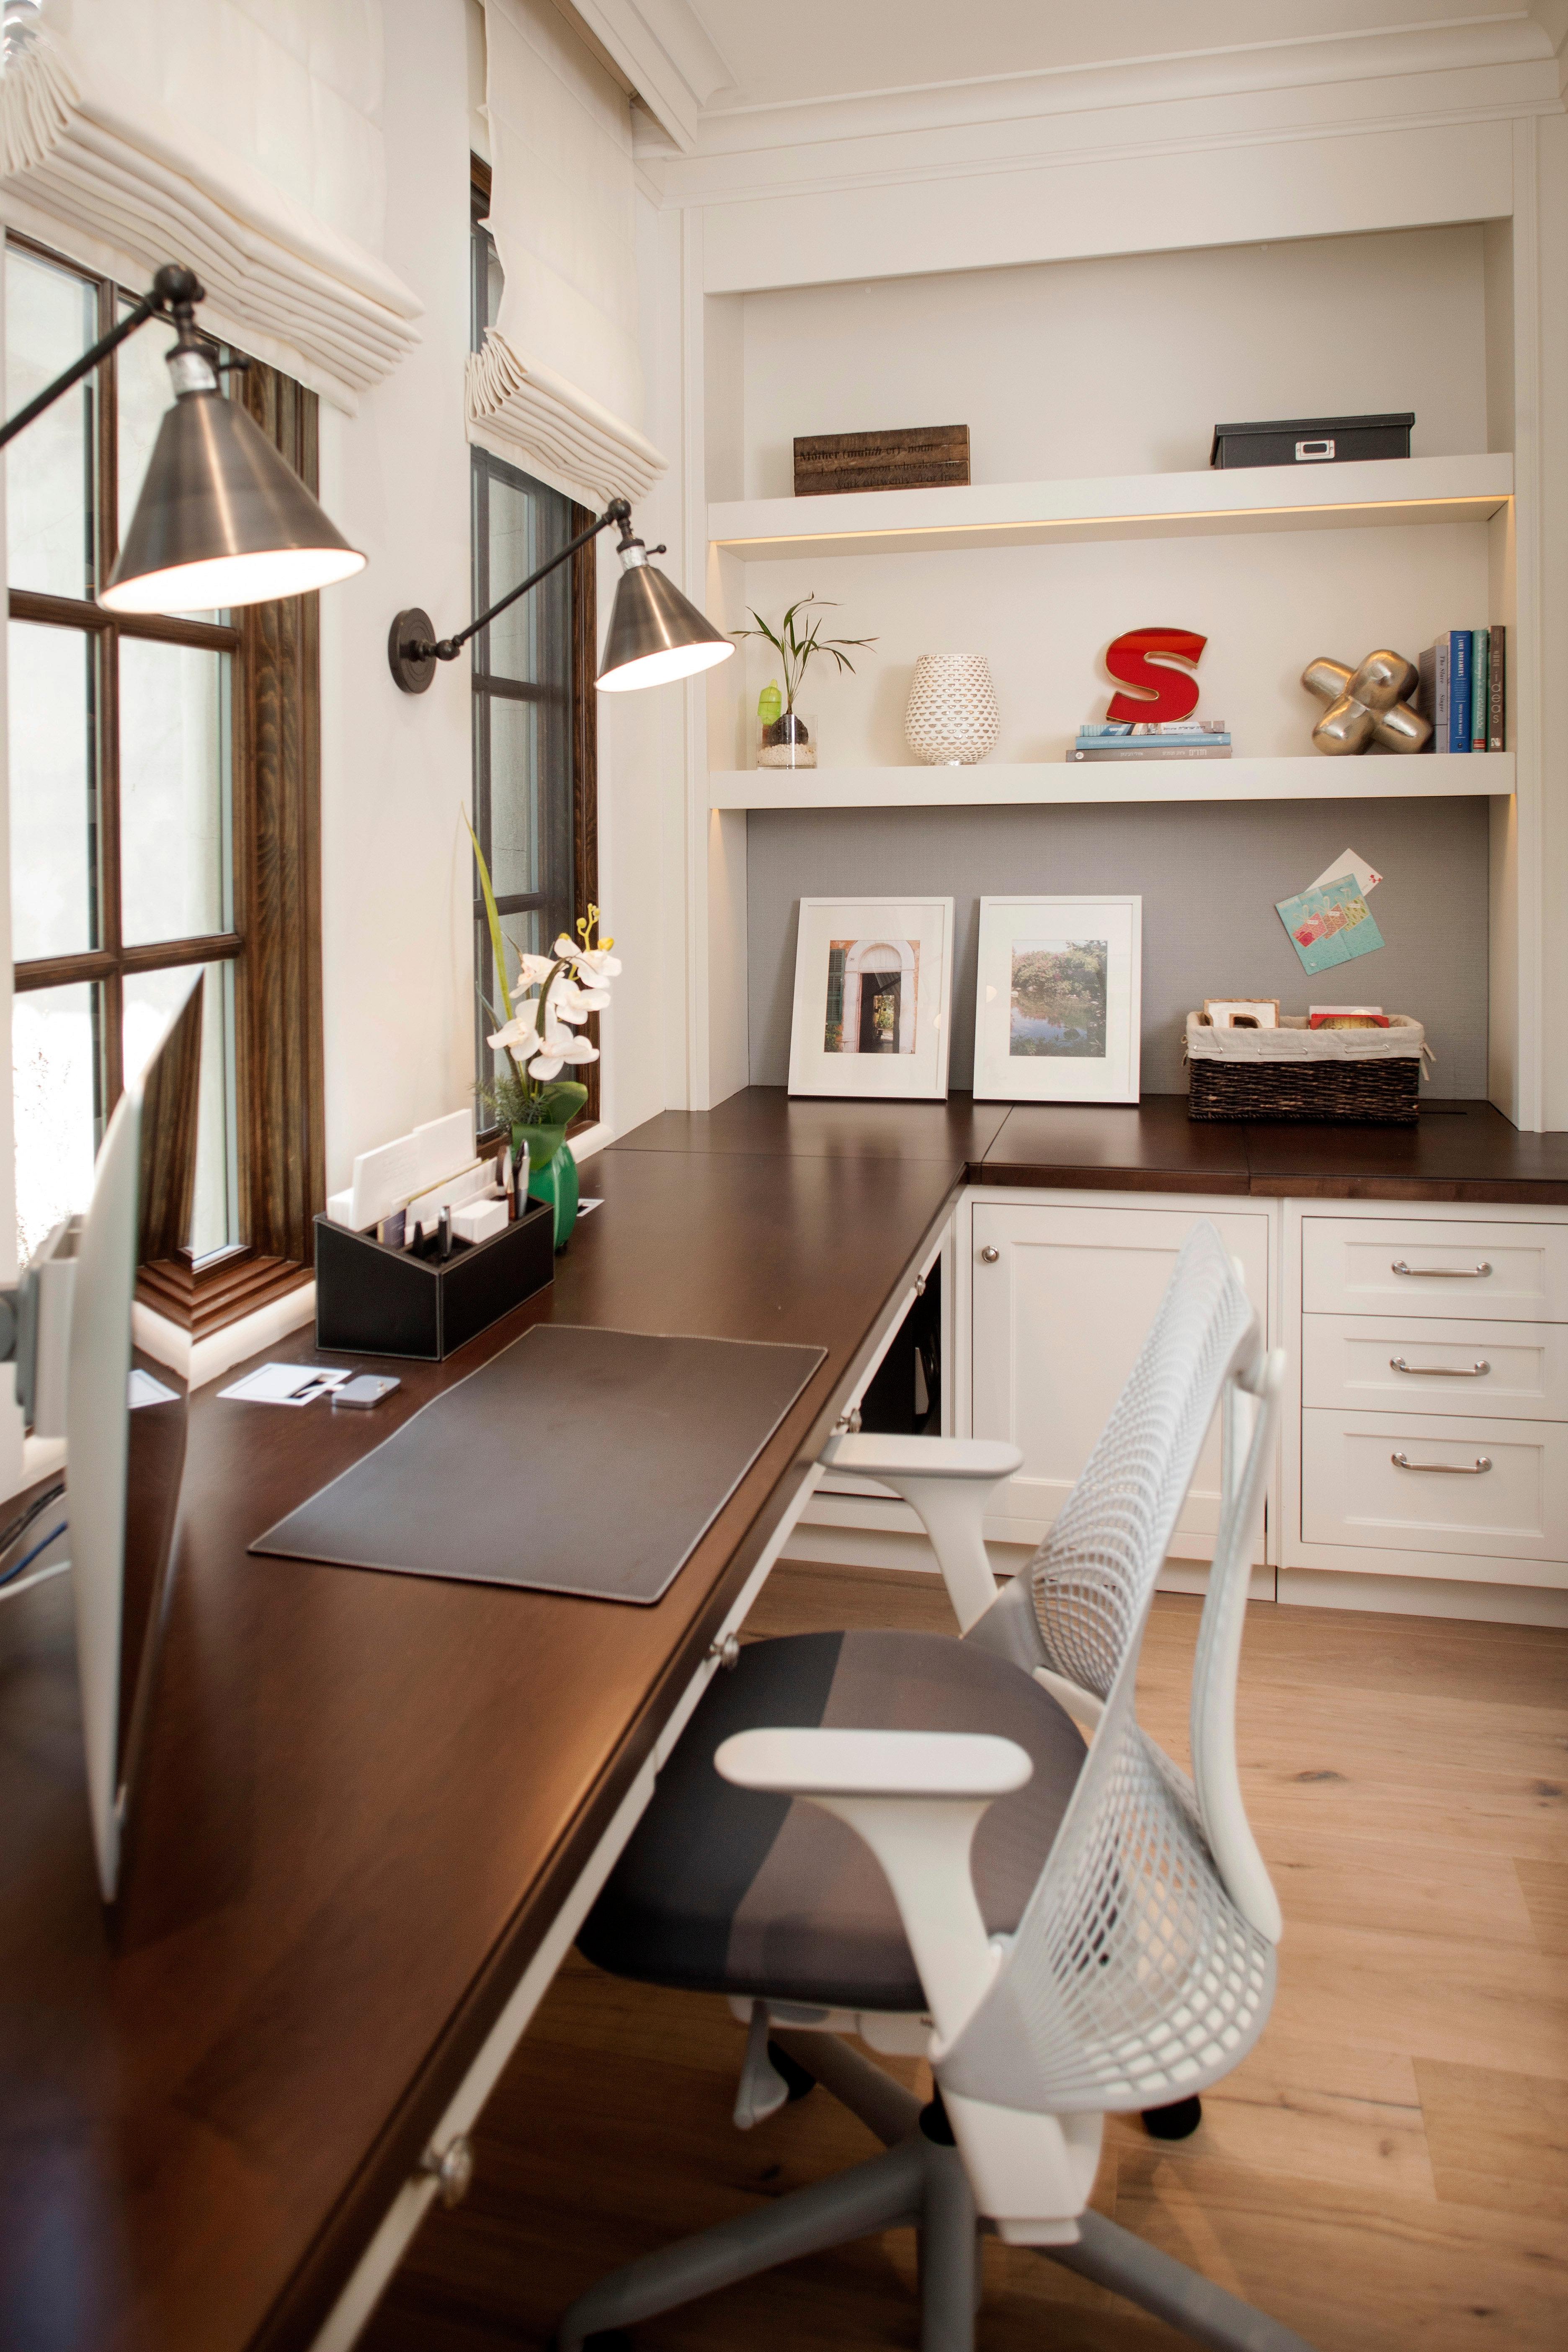 Studio Aya Interior Designer Interior Design services in San